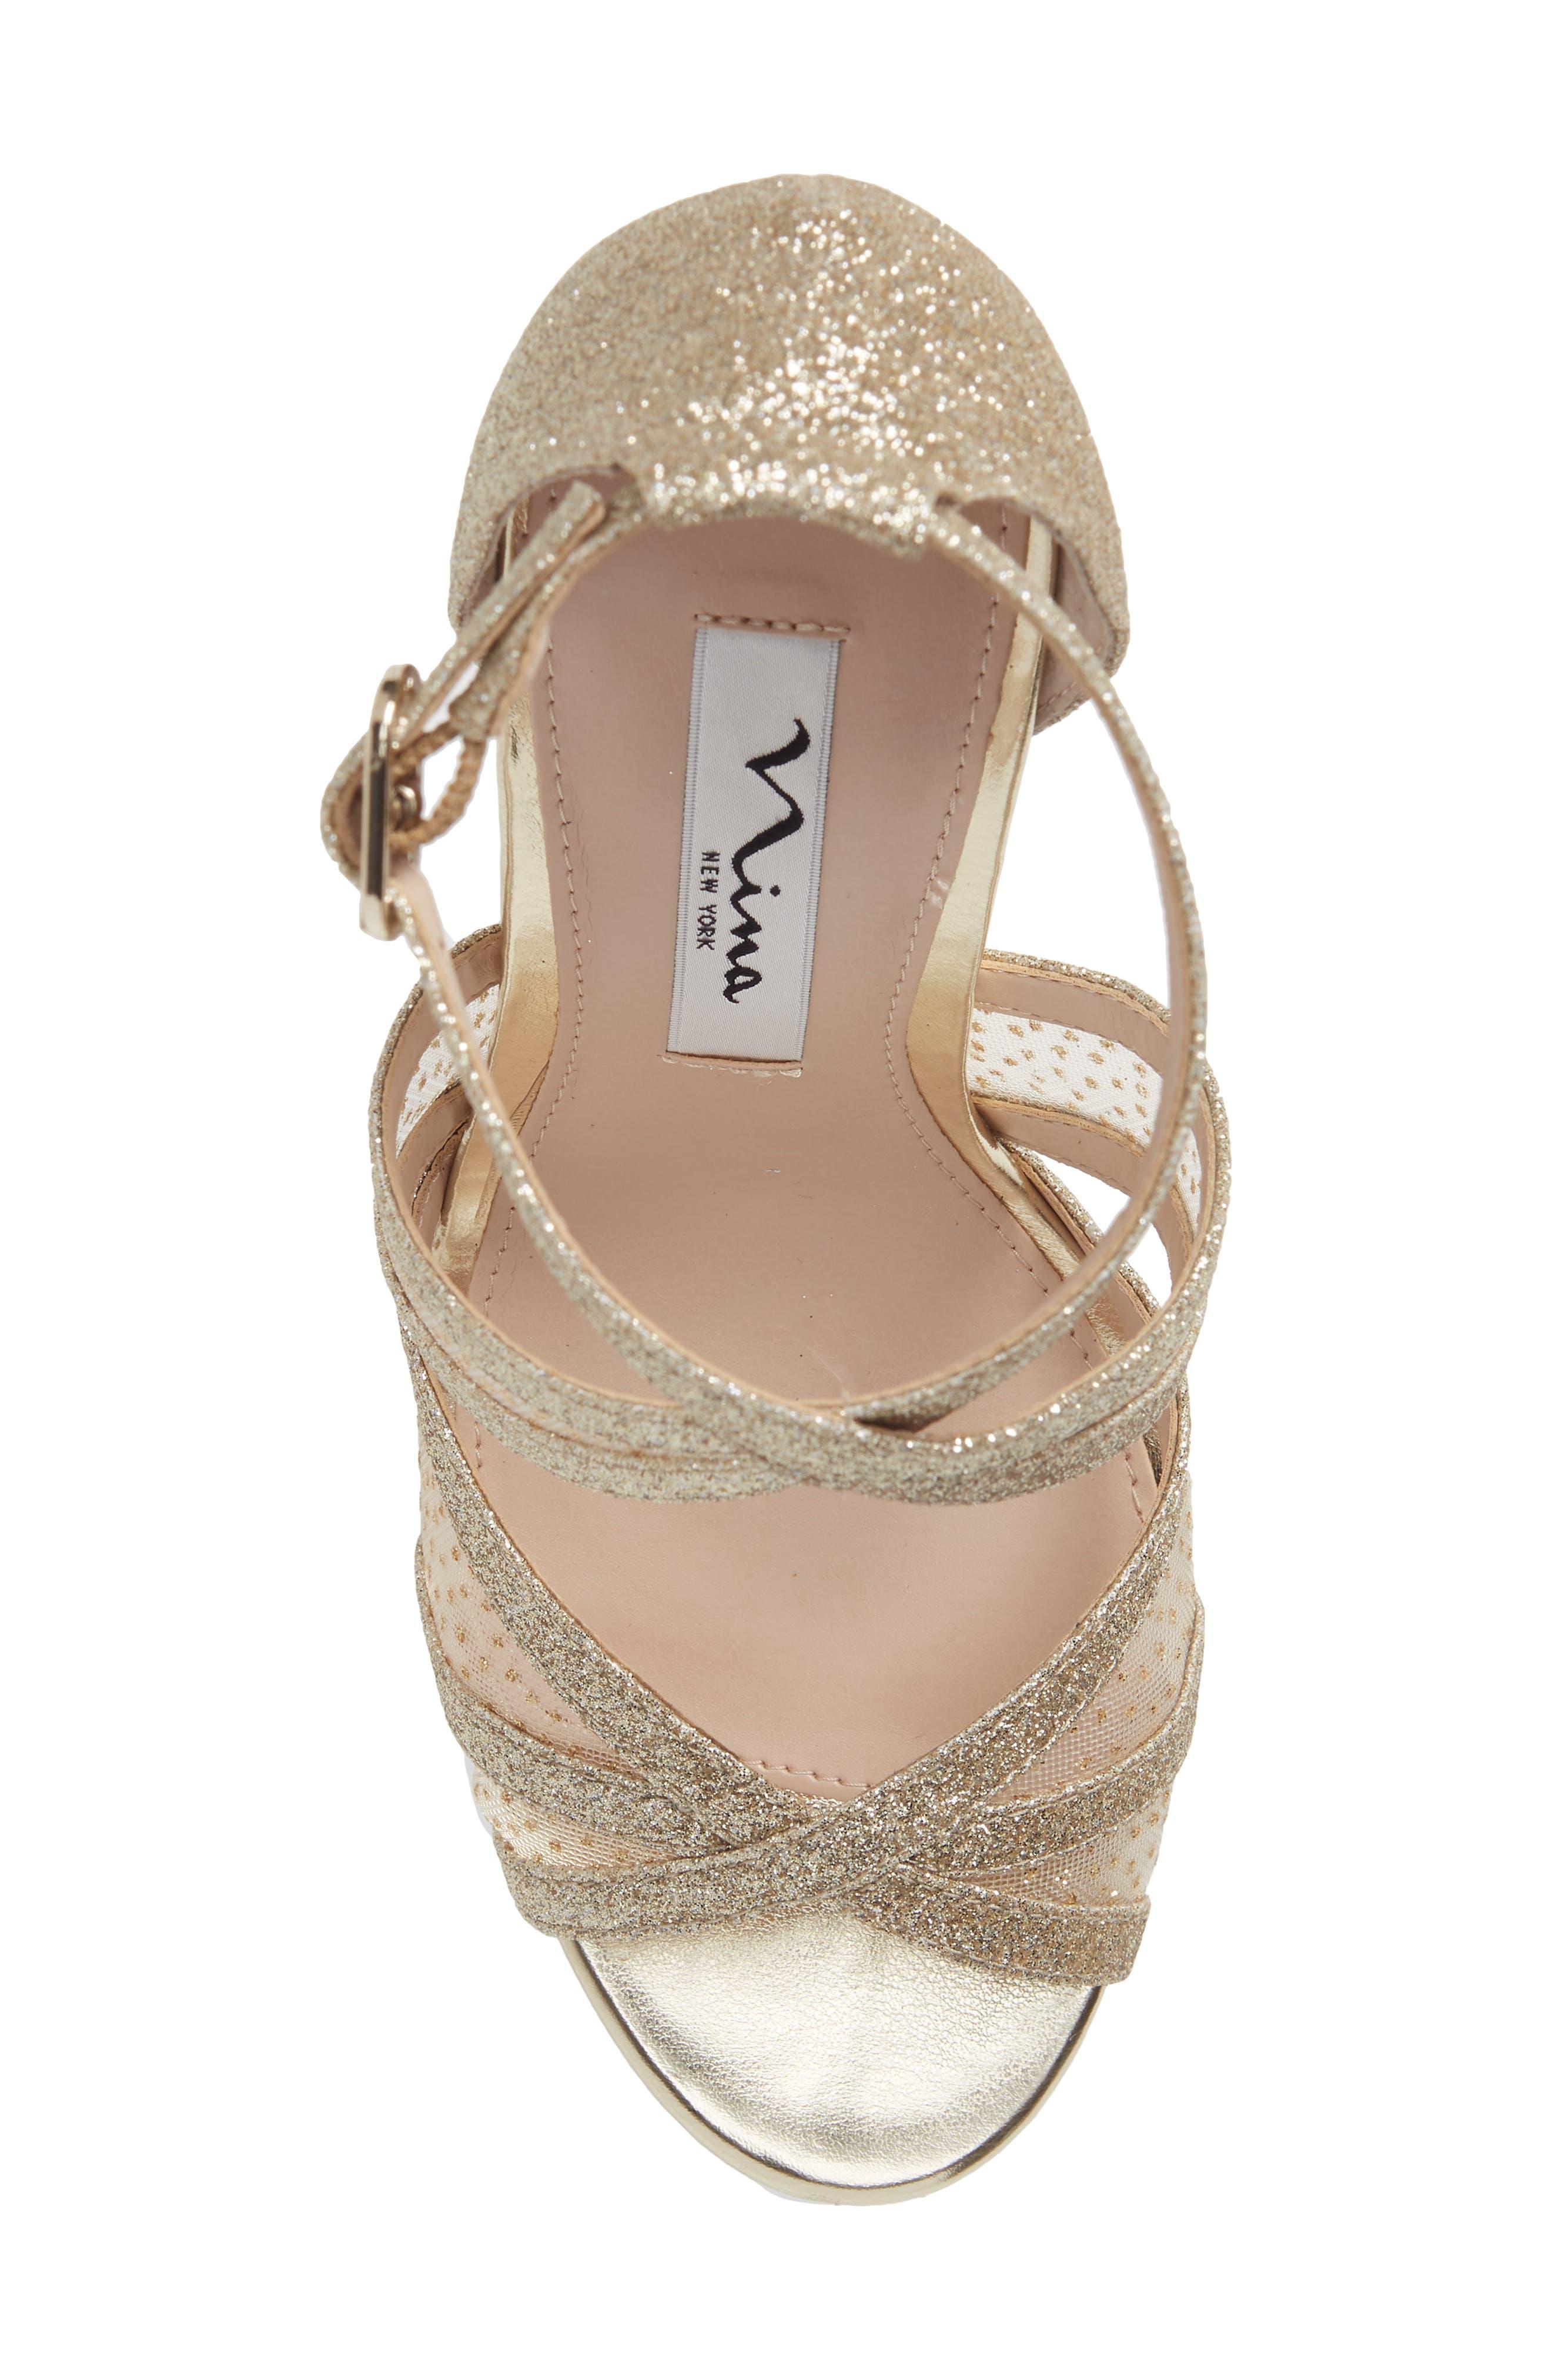 NINA, Fenna Strappy Platform Sandal, Alternate thumbnail 5, color, GOLD GLITTER FABRIC